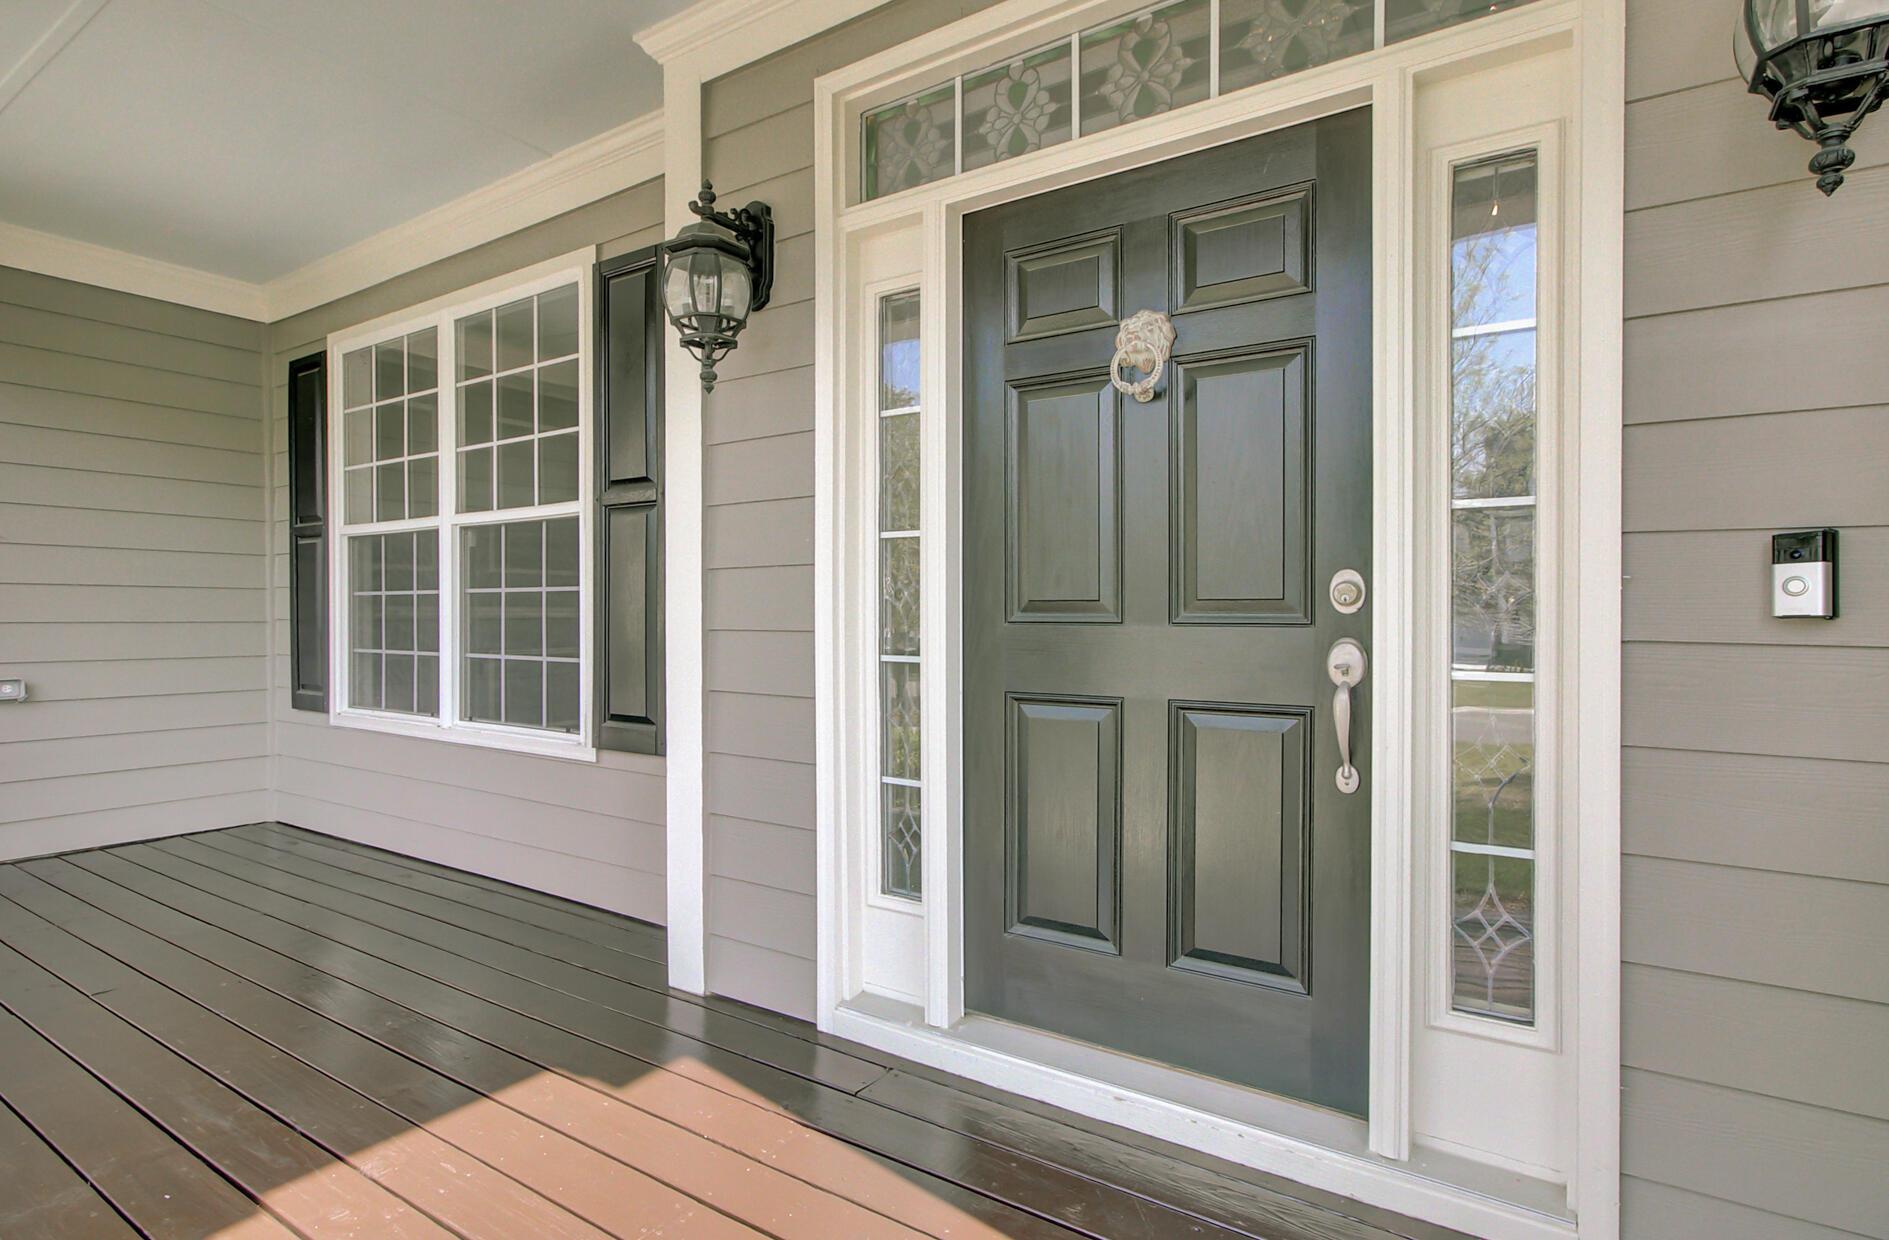 Marsh Cove Homes For Sale - 2928 Riverwood, Mount Pleasant, SC - 21